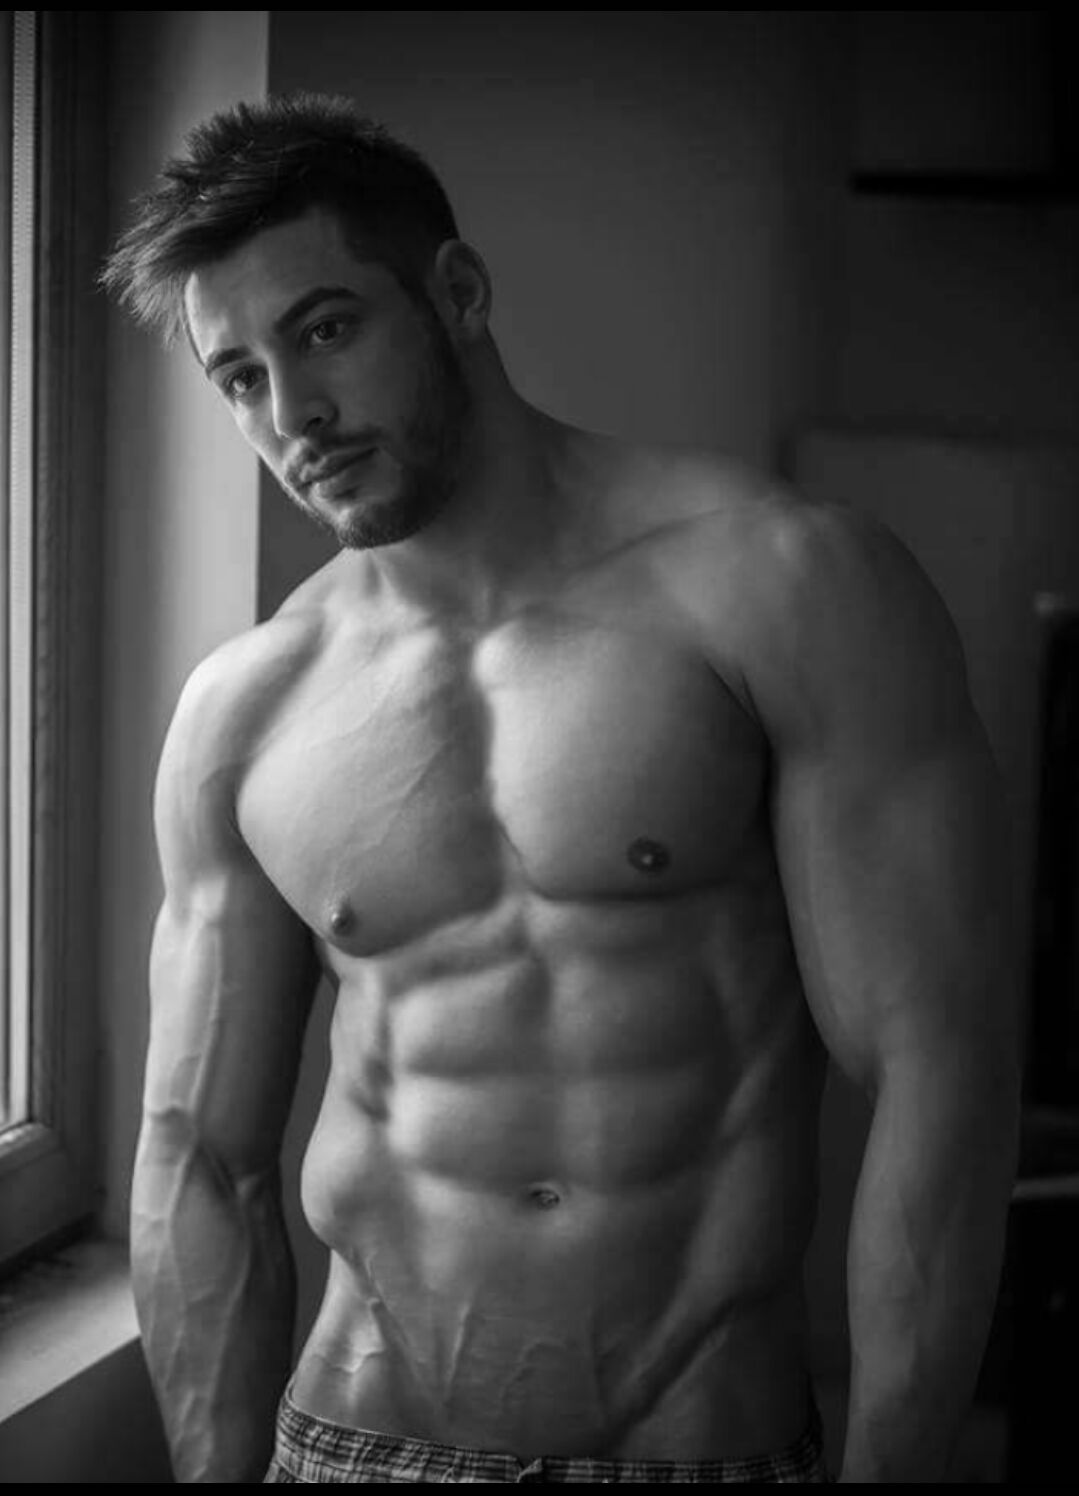 Nude male muscle models